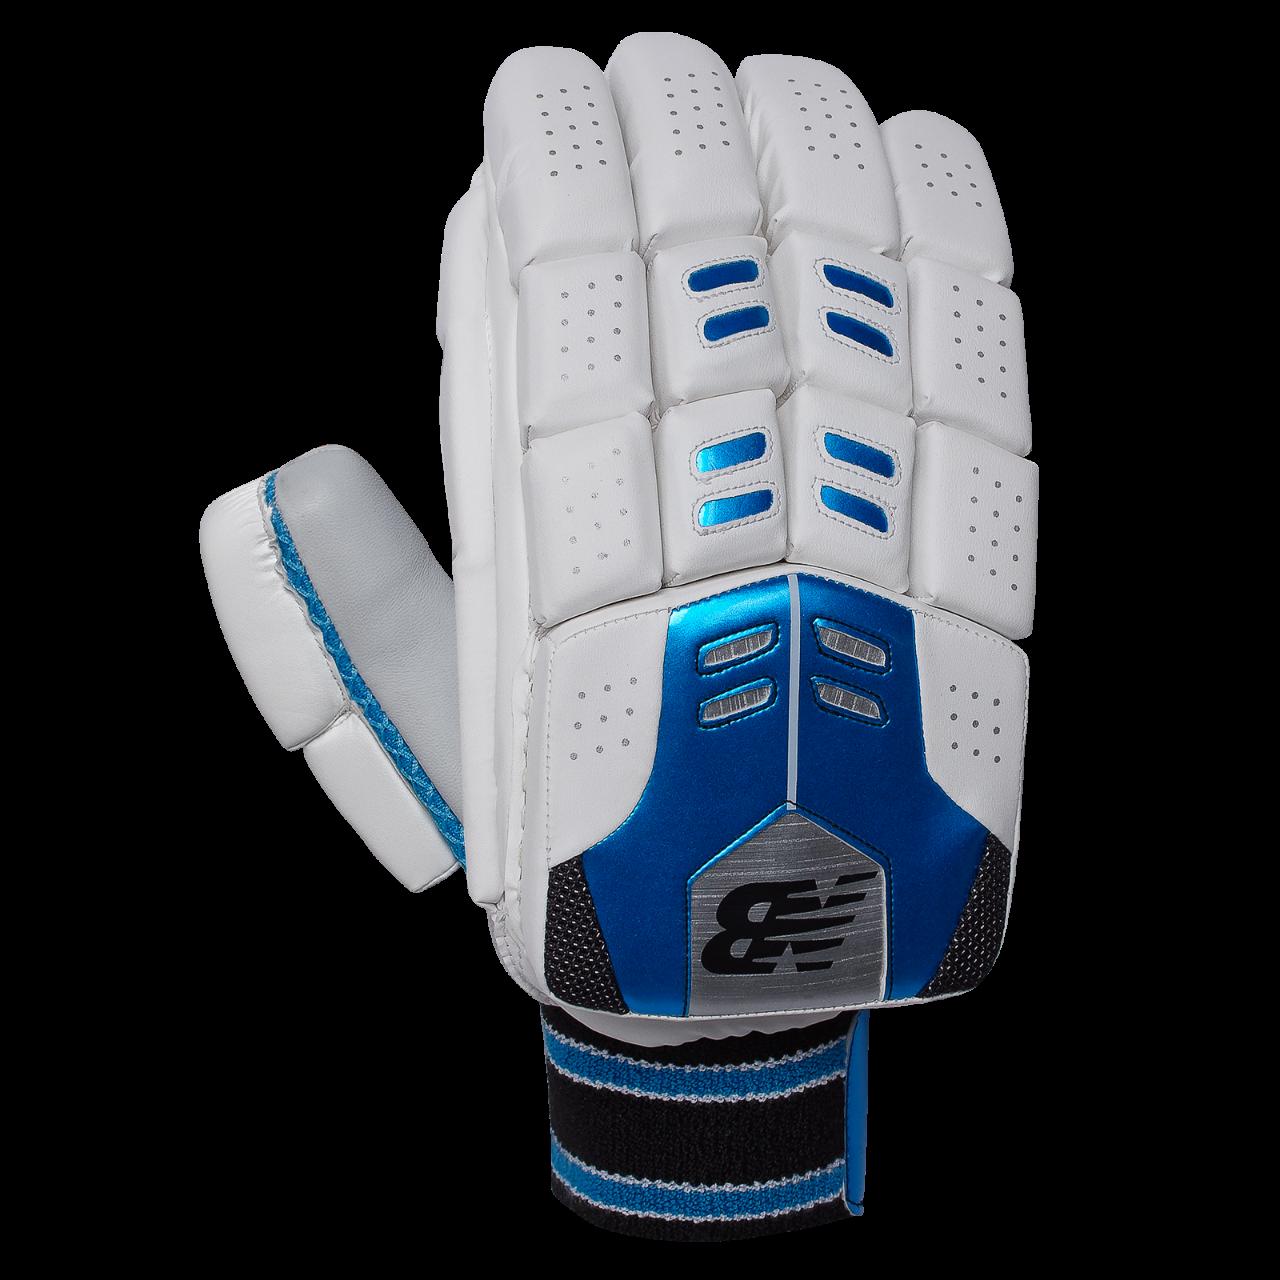 new balance football gloves